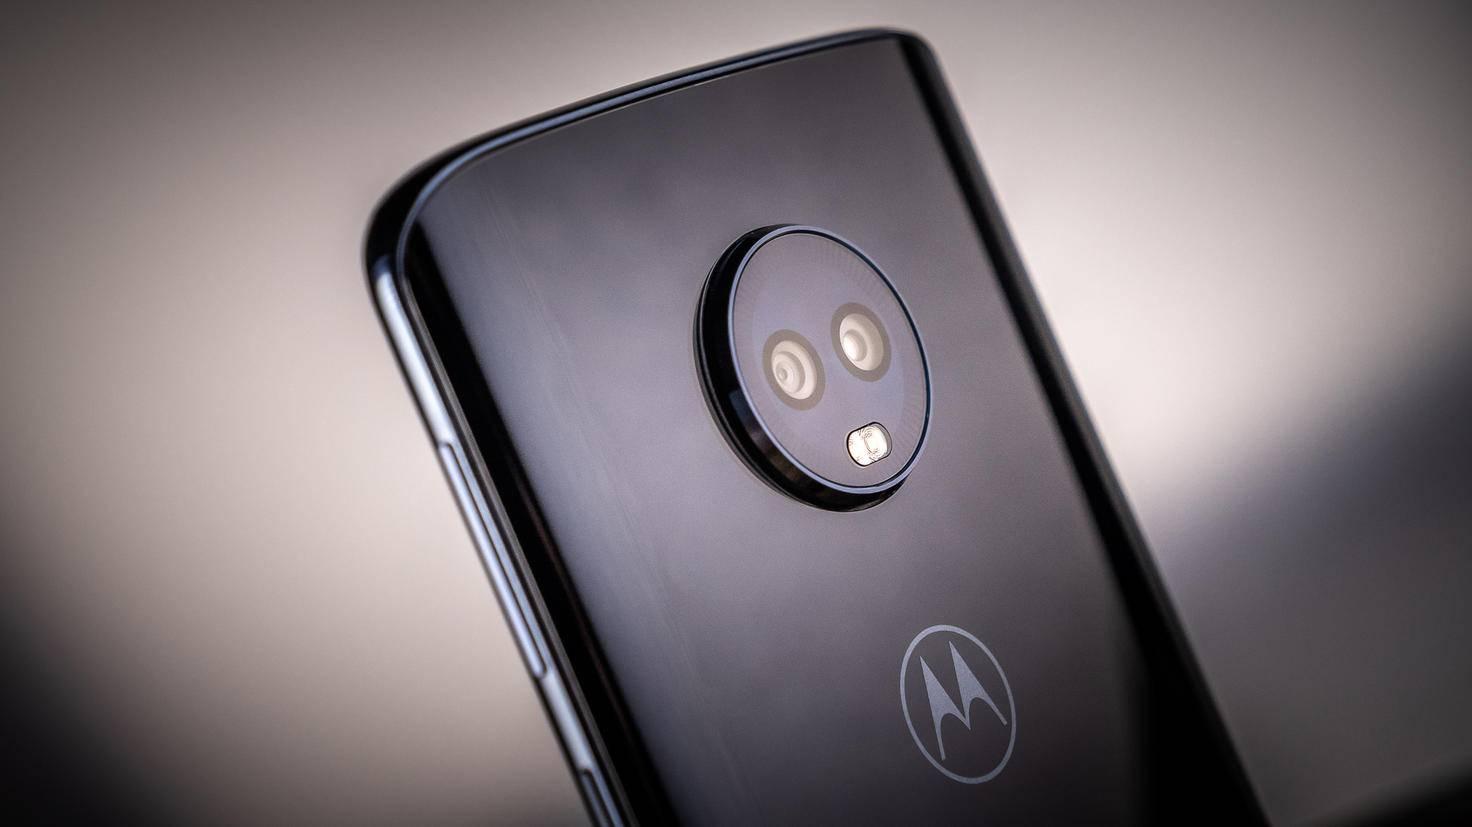 Motorola-Moto-G6-Plus-TURN-ON-5